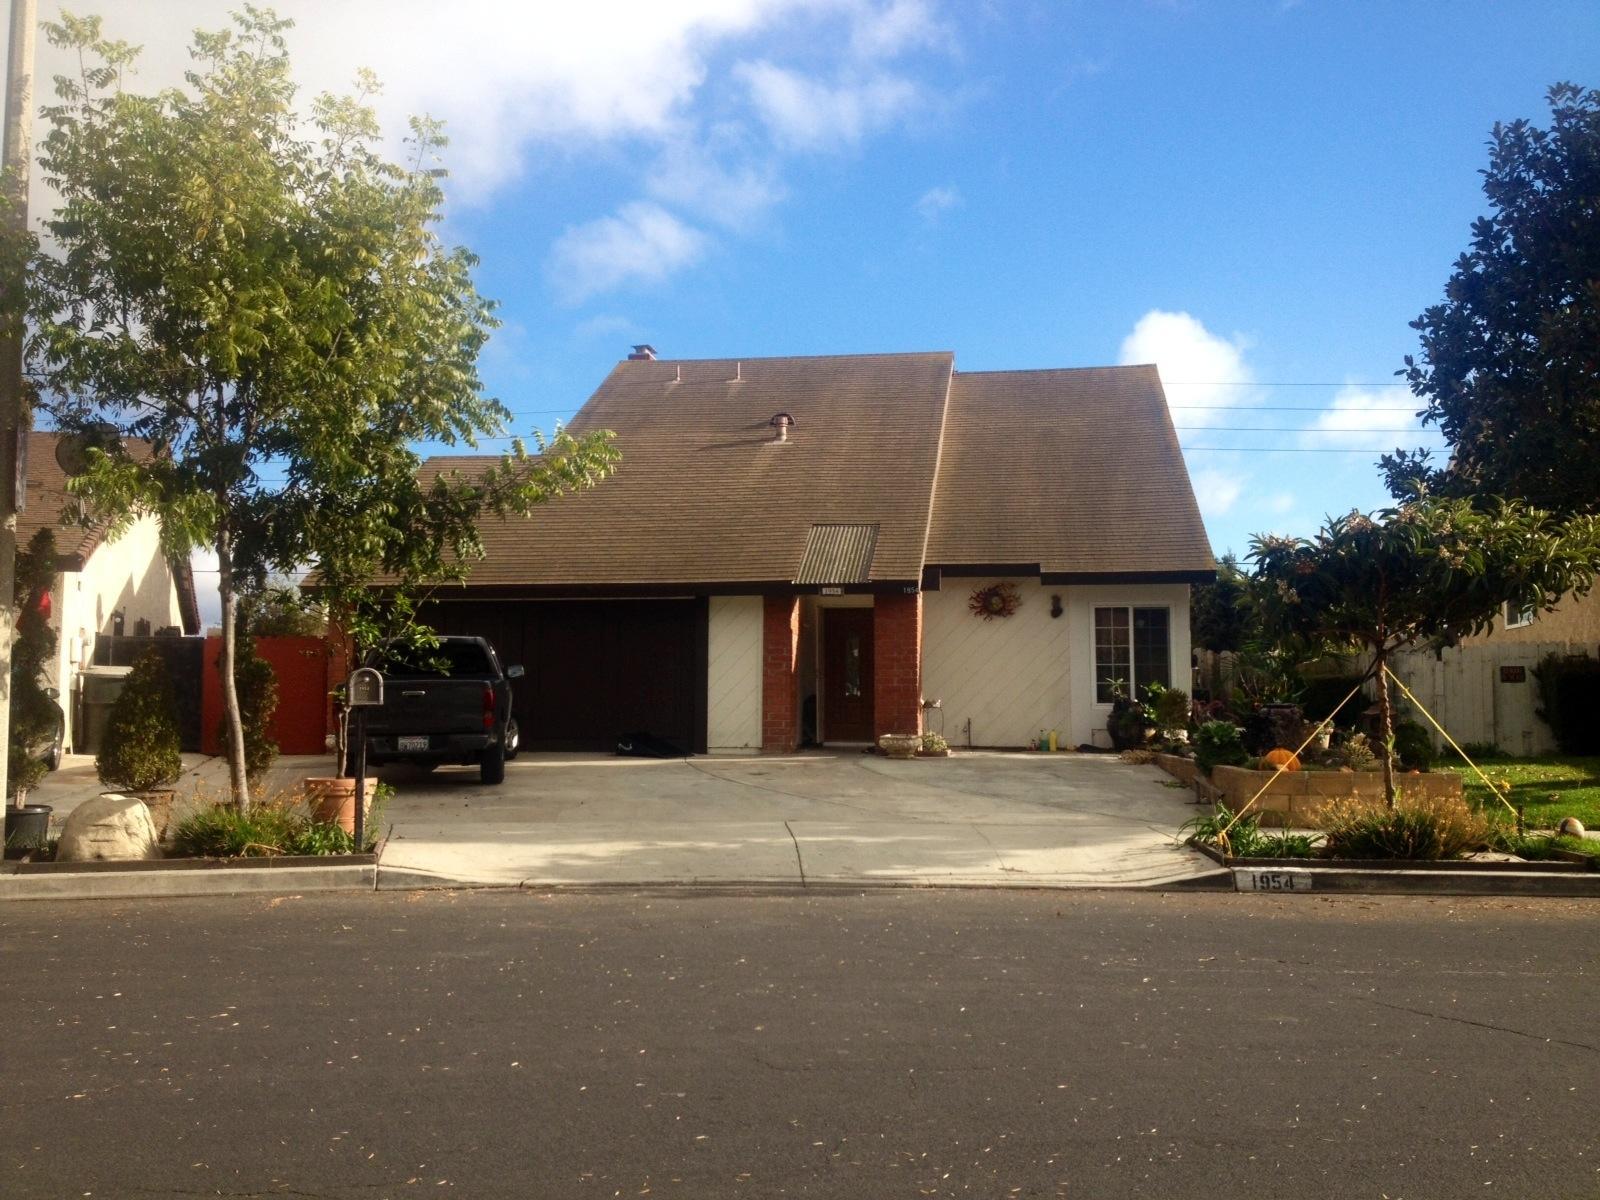 Property photo for 1954 Berkshire St Oxnard, California 93033 - 13-3654